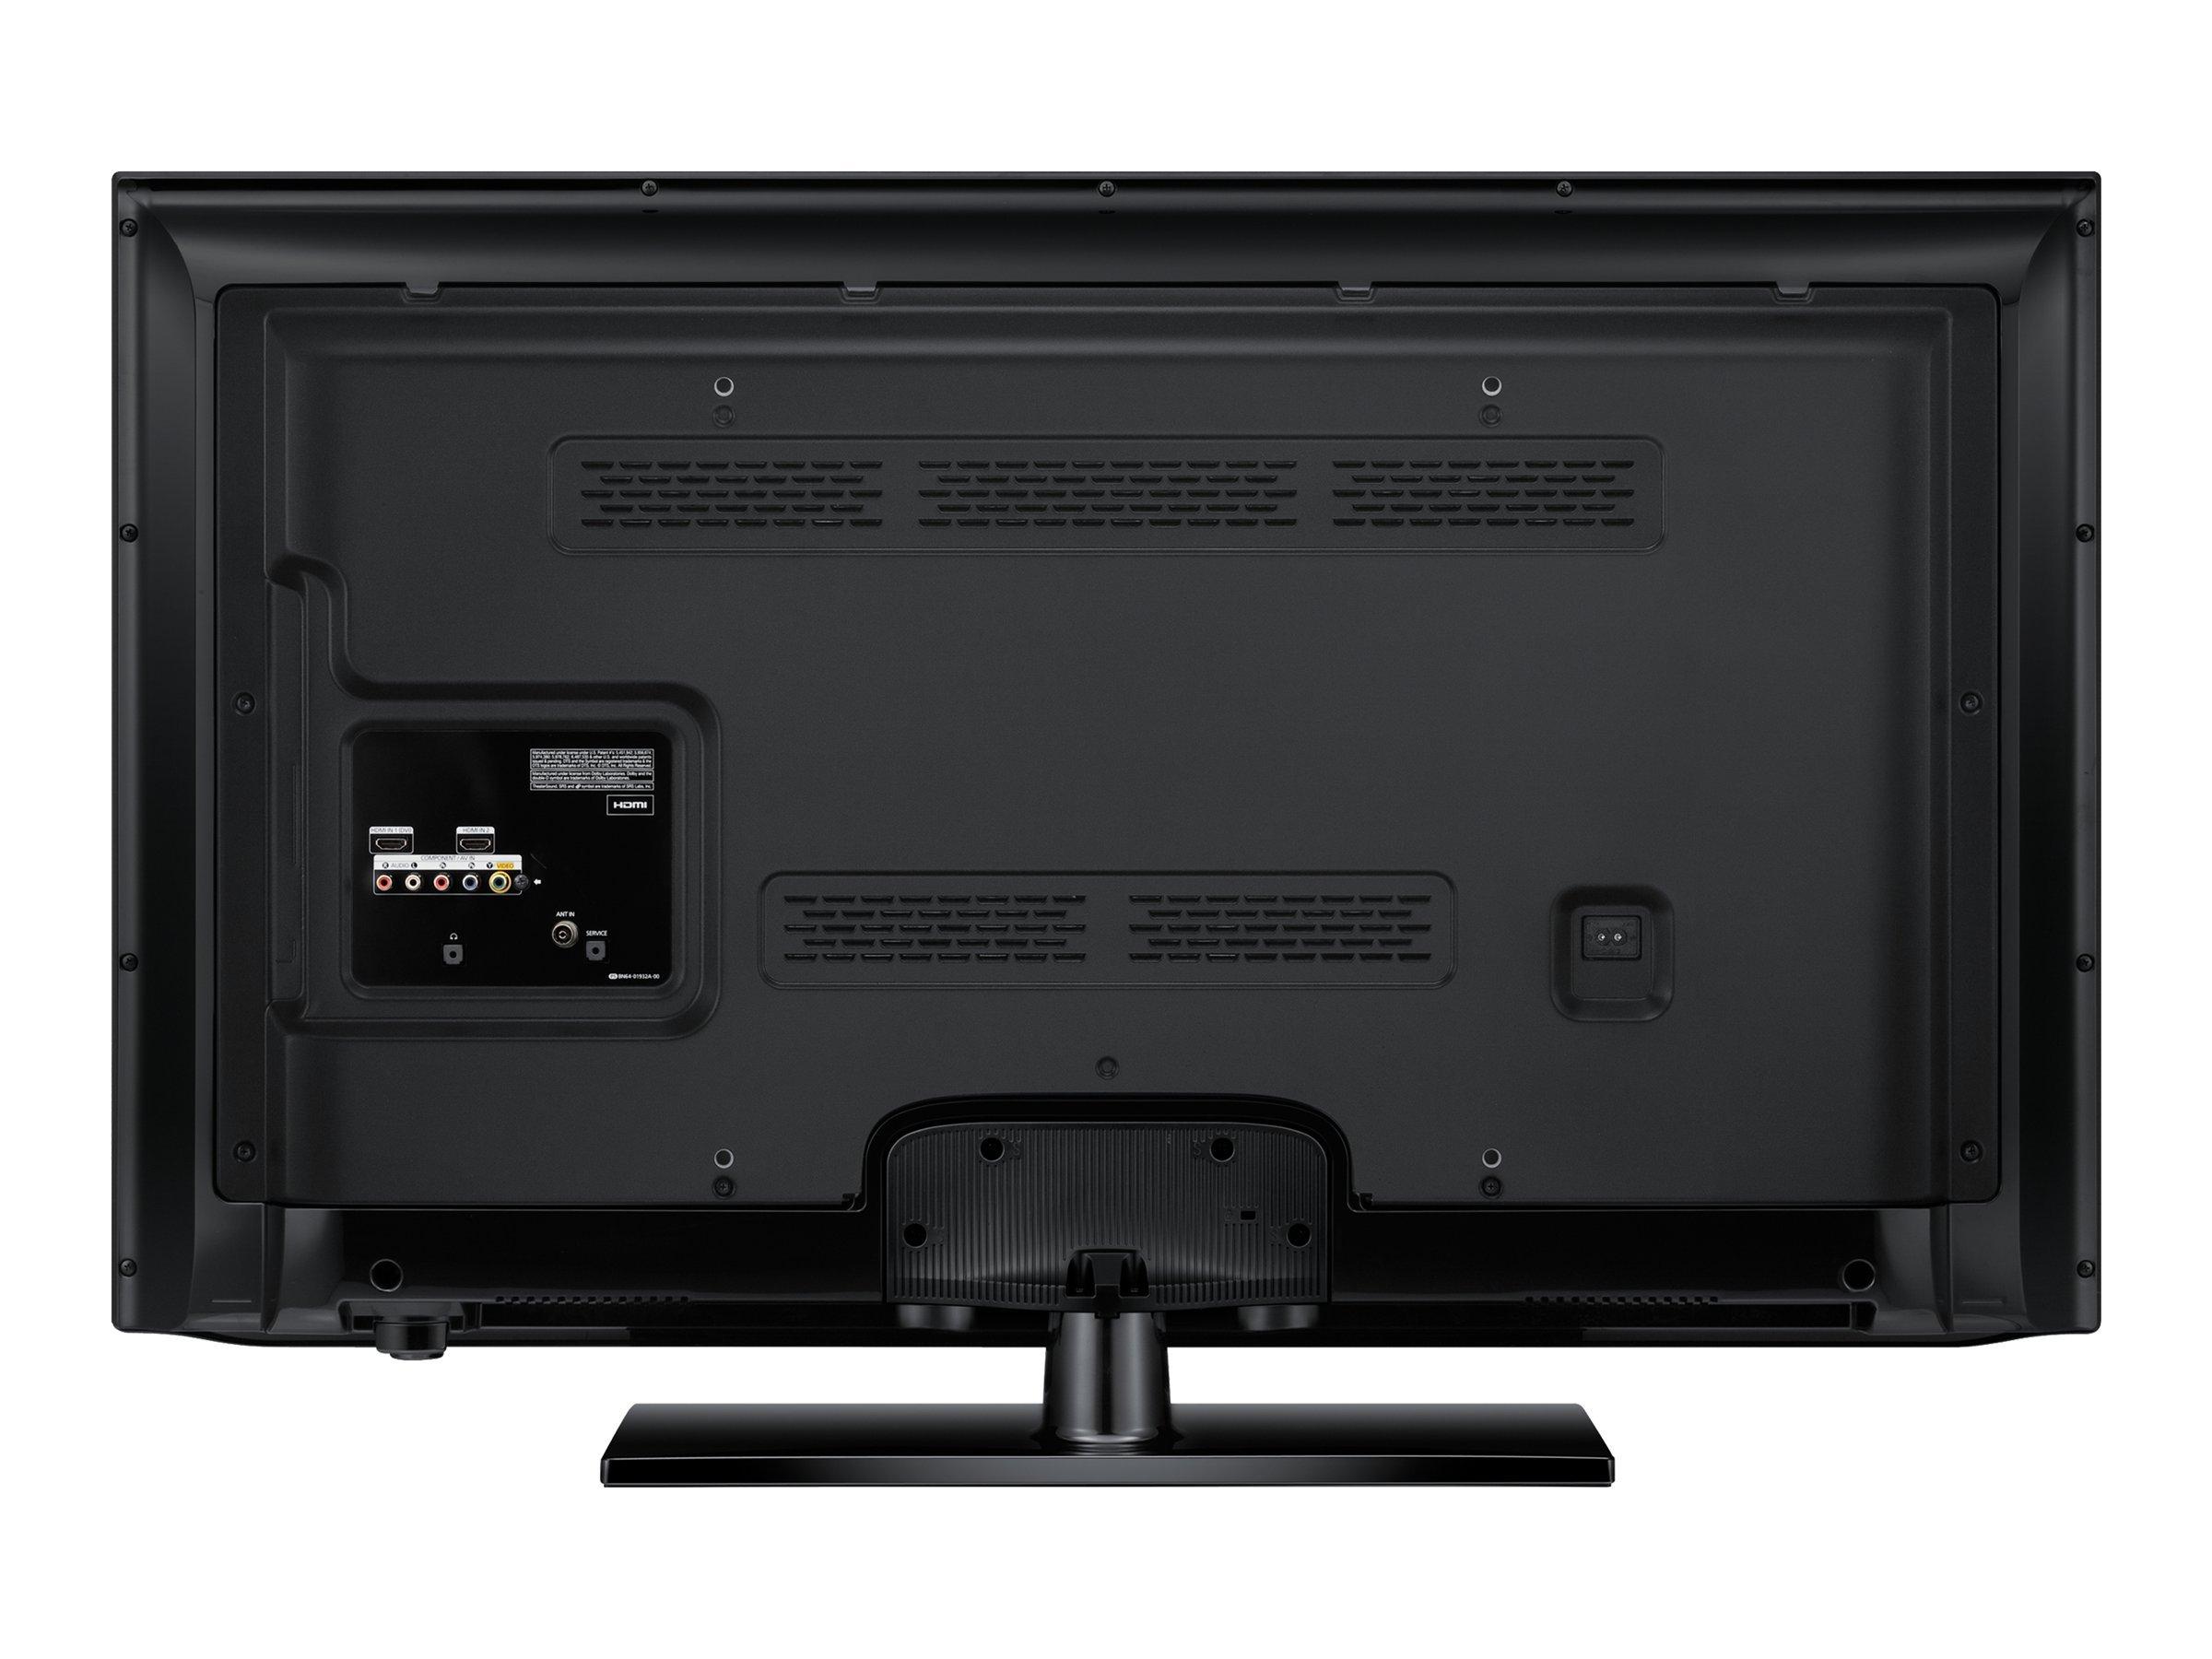 "Samsung 46"" Class 1080p 60Hz LED HDTV - UN46EH5000"